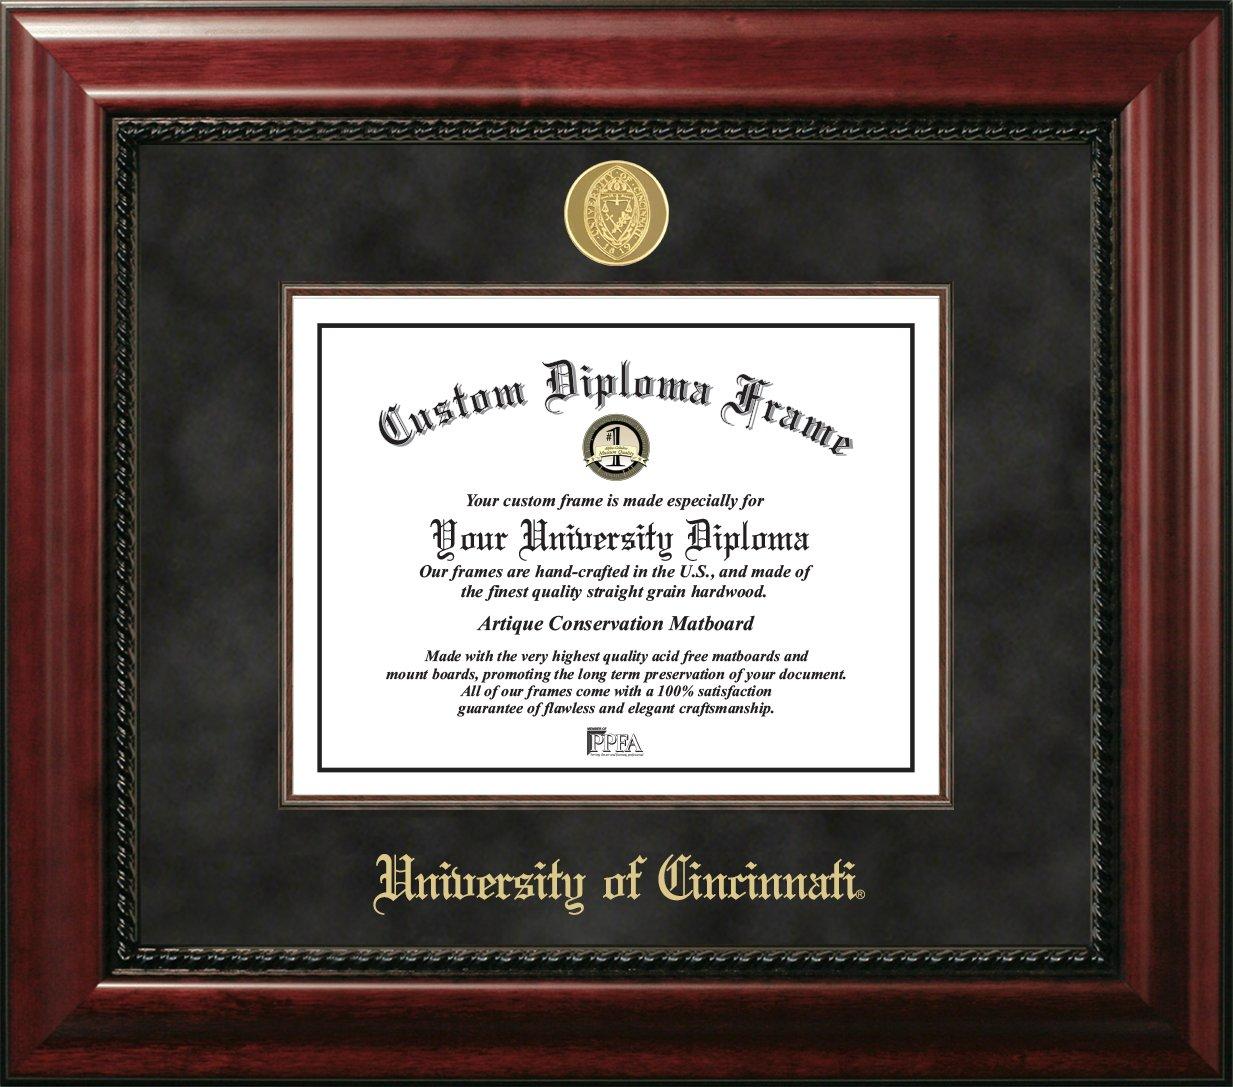 Campus Images OH984EXM University of Cincinnati Executive 11'' x 8.5''